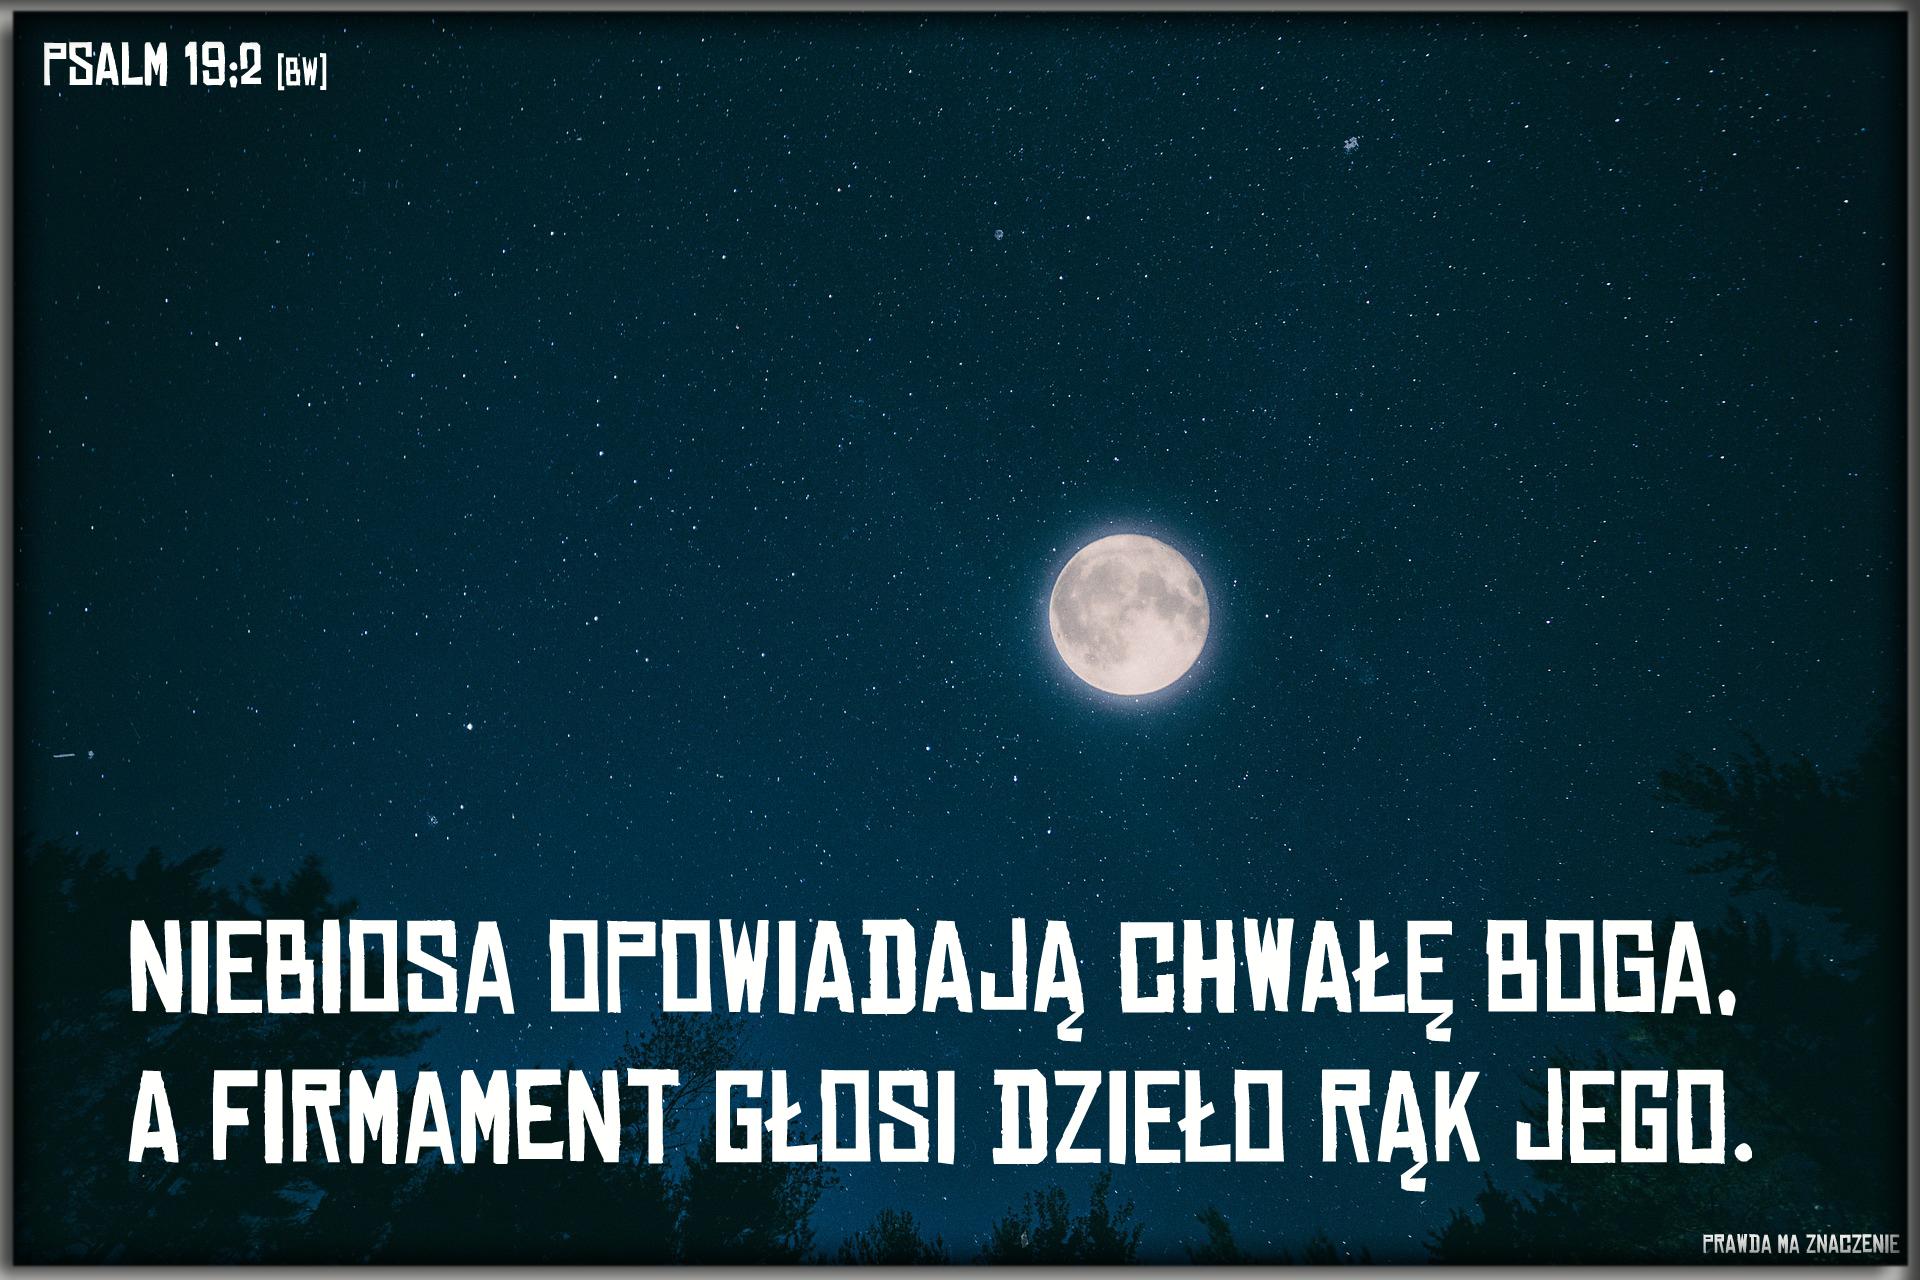 PSALM 19 2